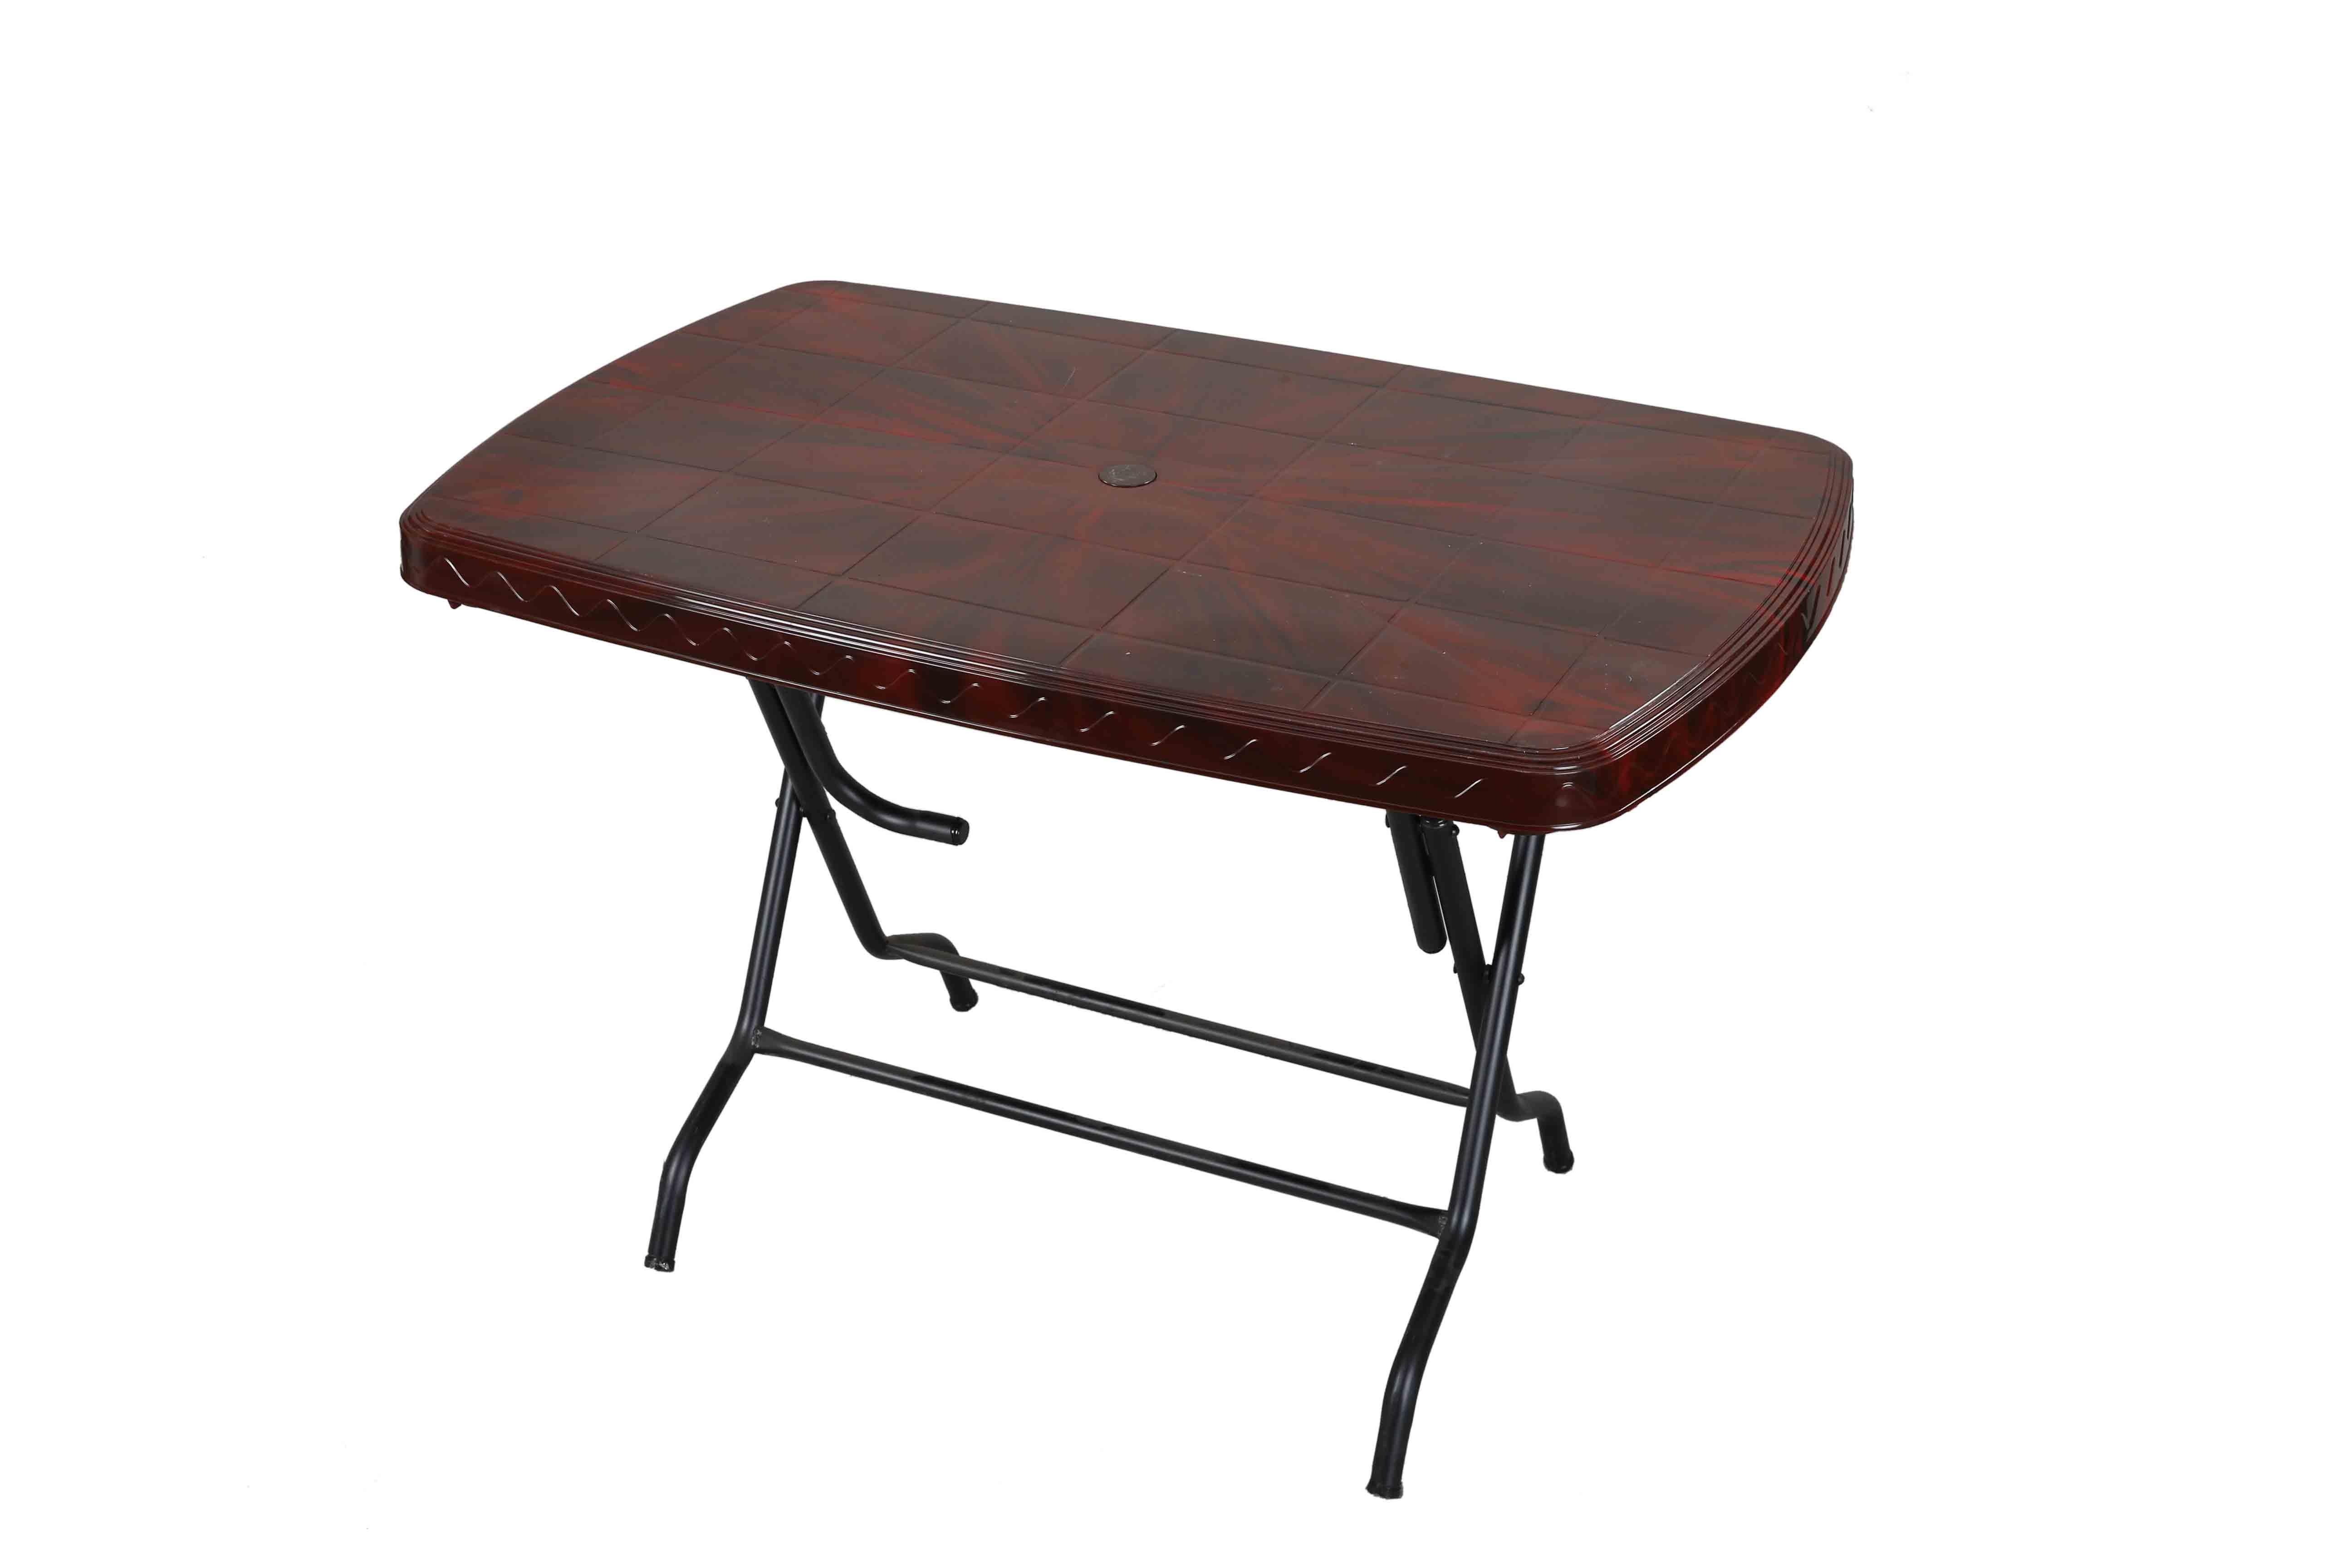 Dining Table 4 Seat Rtg St/Leg – Rose Wood